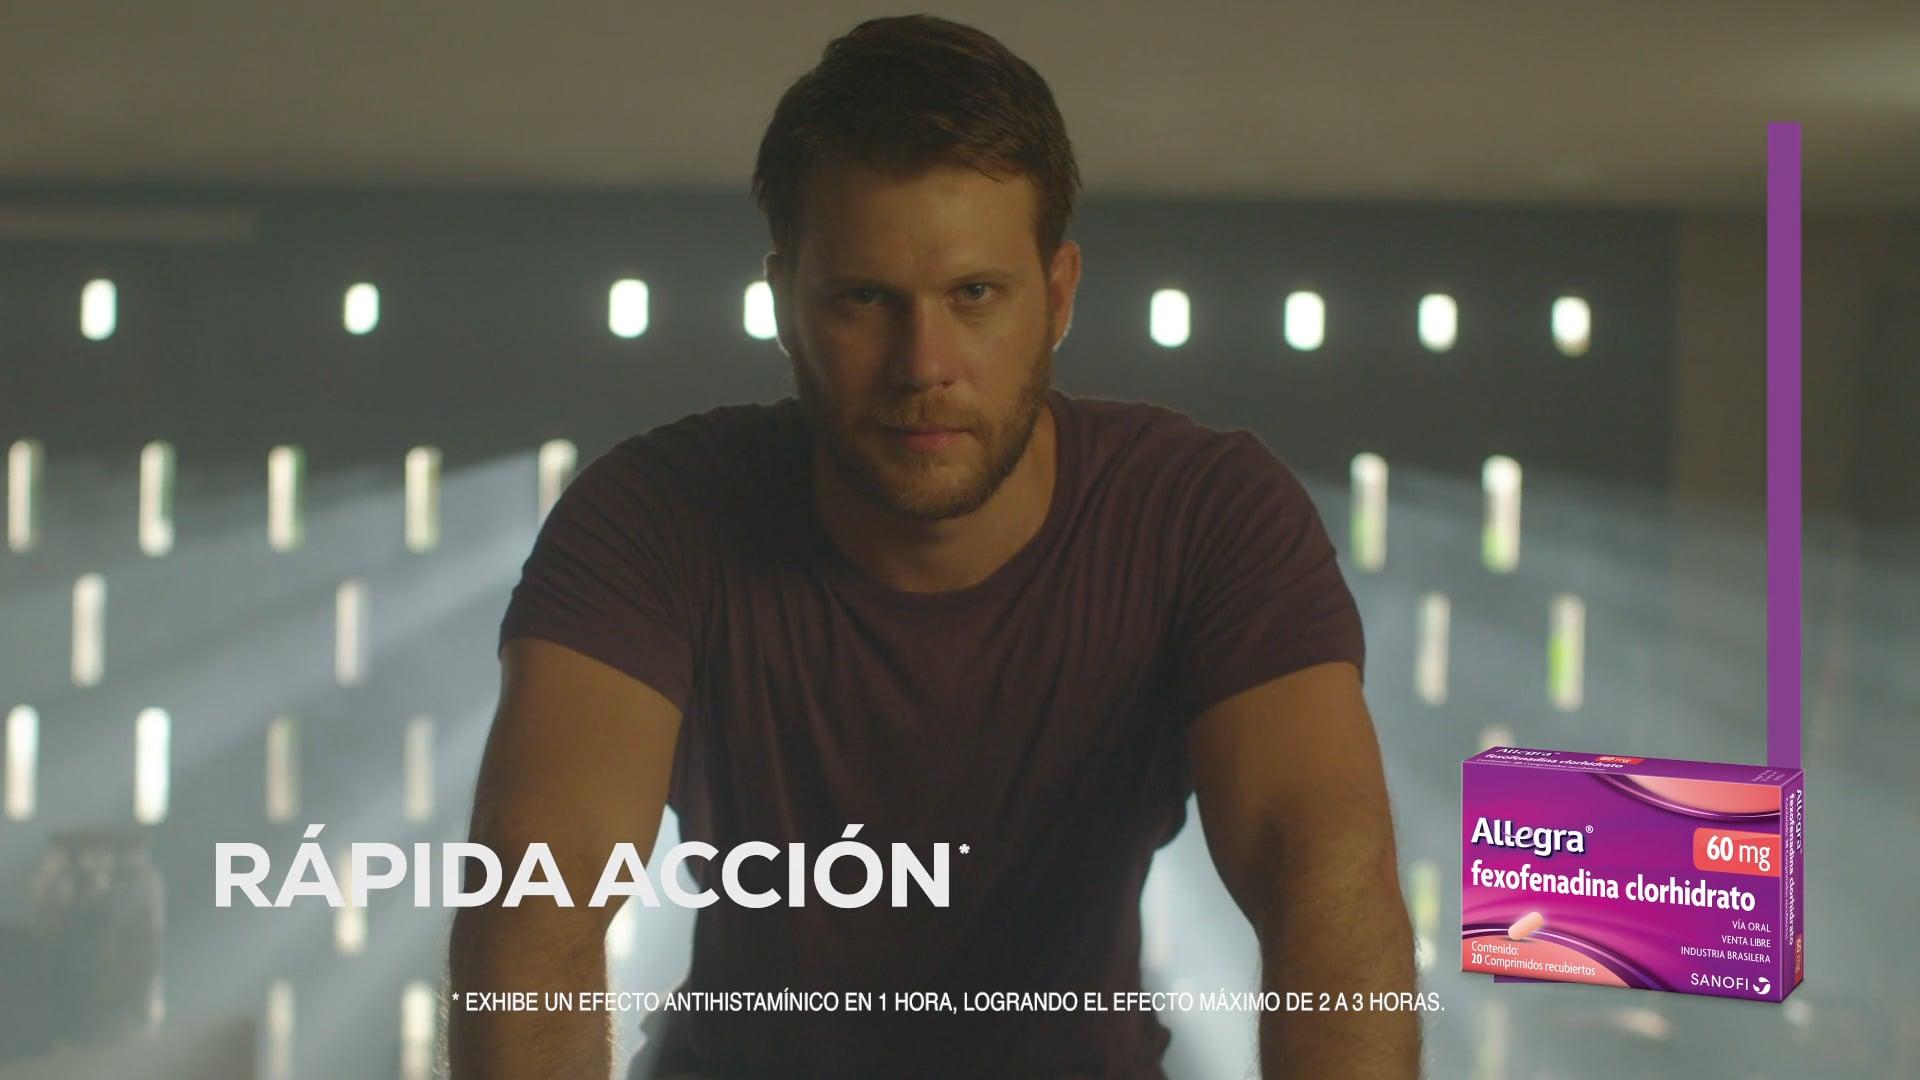 McCann Erickson Buenos Aires I Allegra